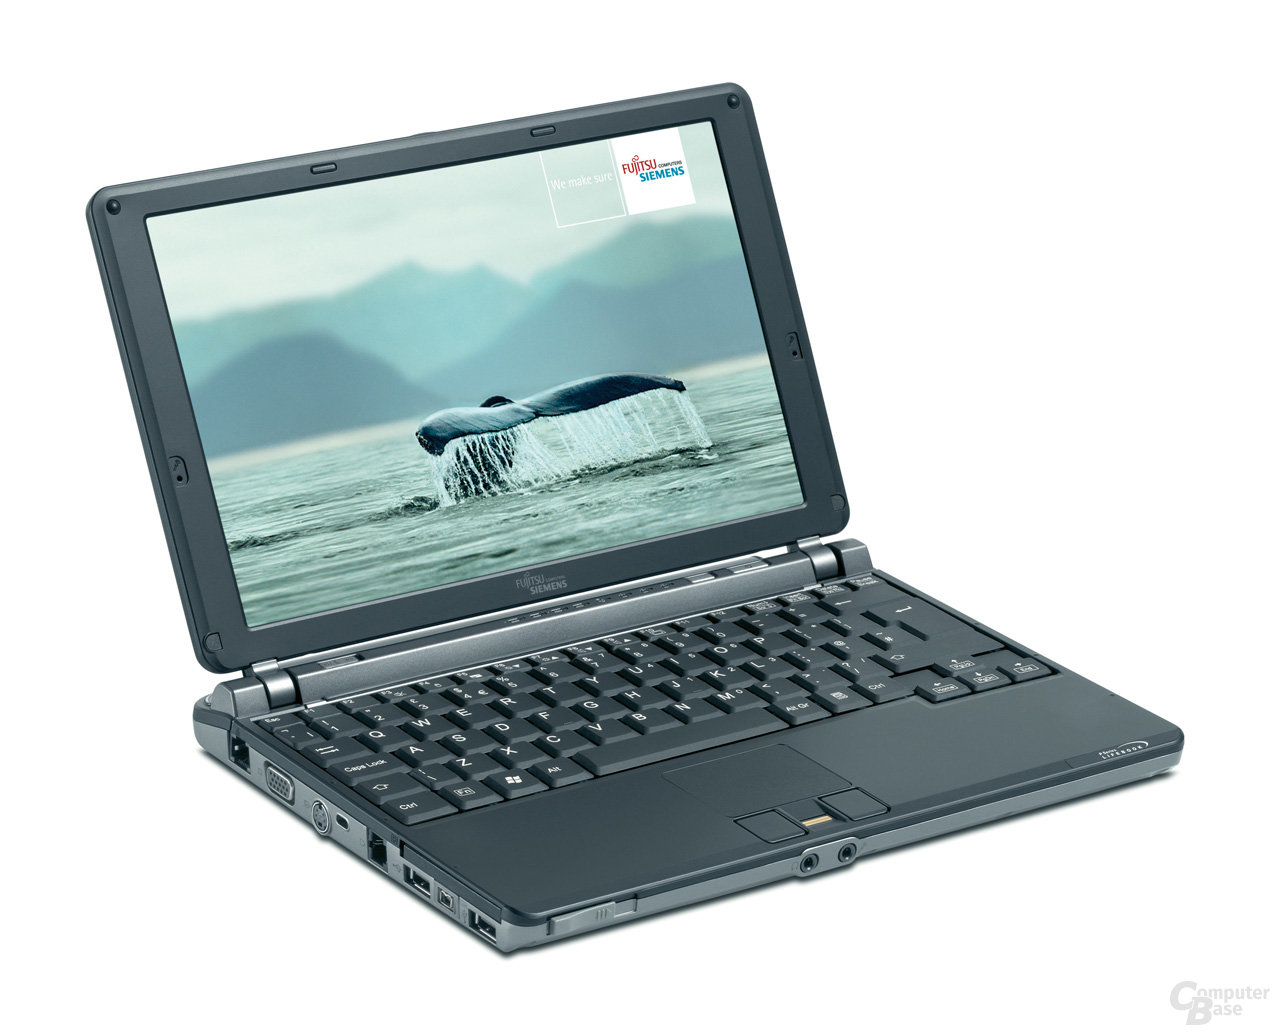 http://www.computerbase.de/news/hardware/komplettsysteme/notebooks/2005/september/sony_125-kg-notebook/